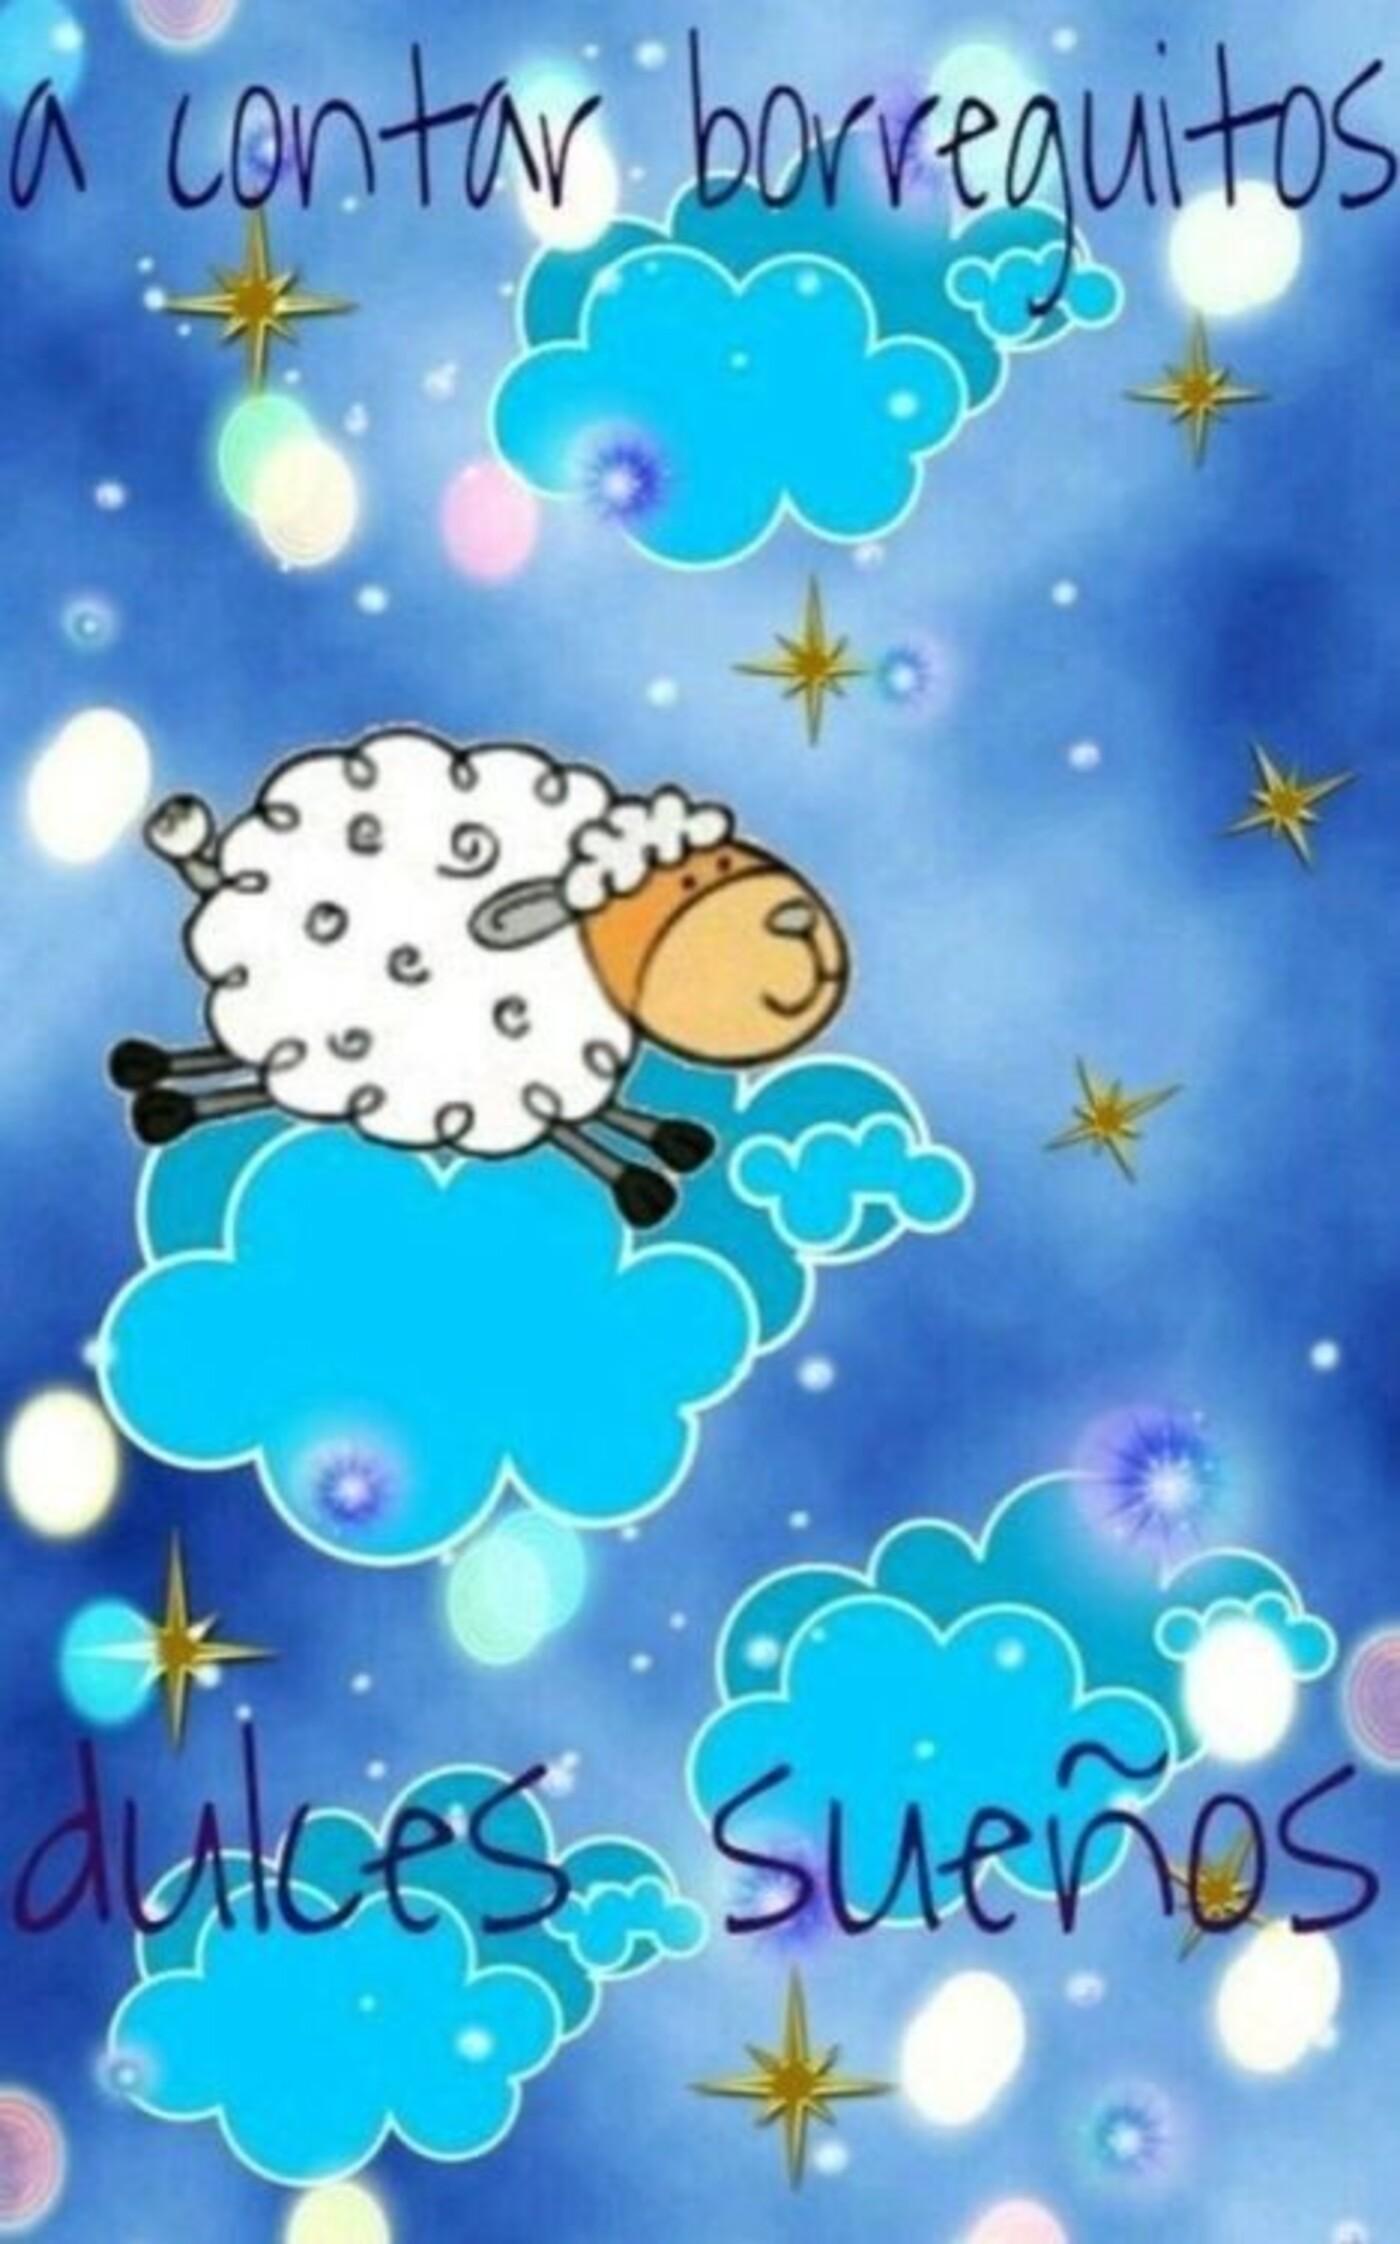 A contar borreguitos, Dulces sueños